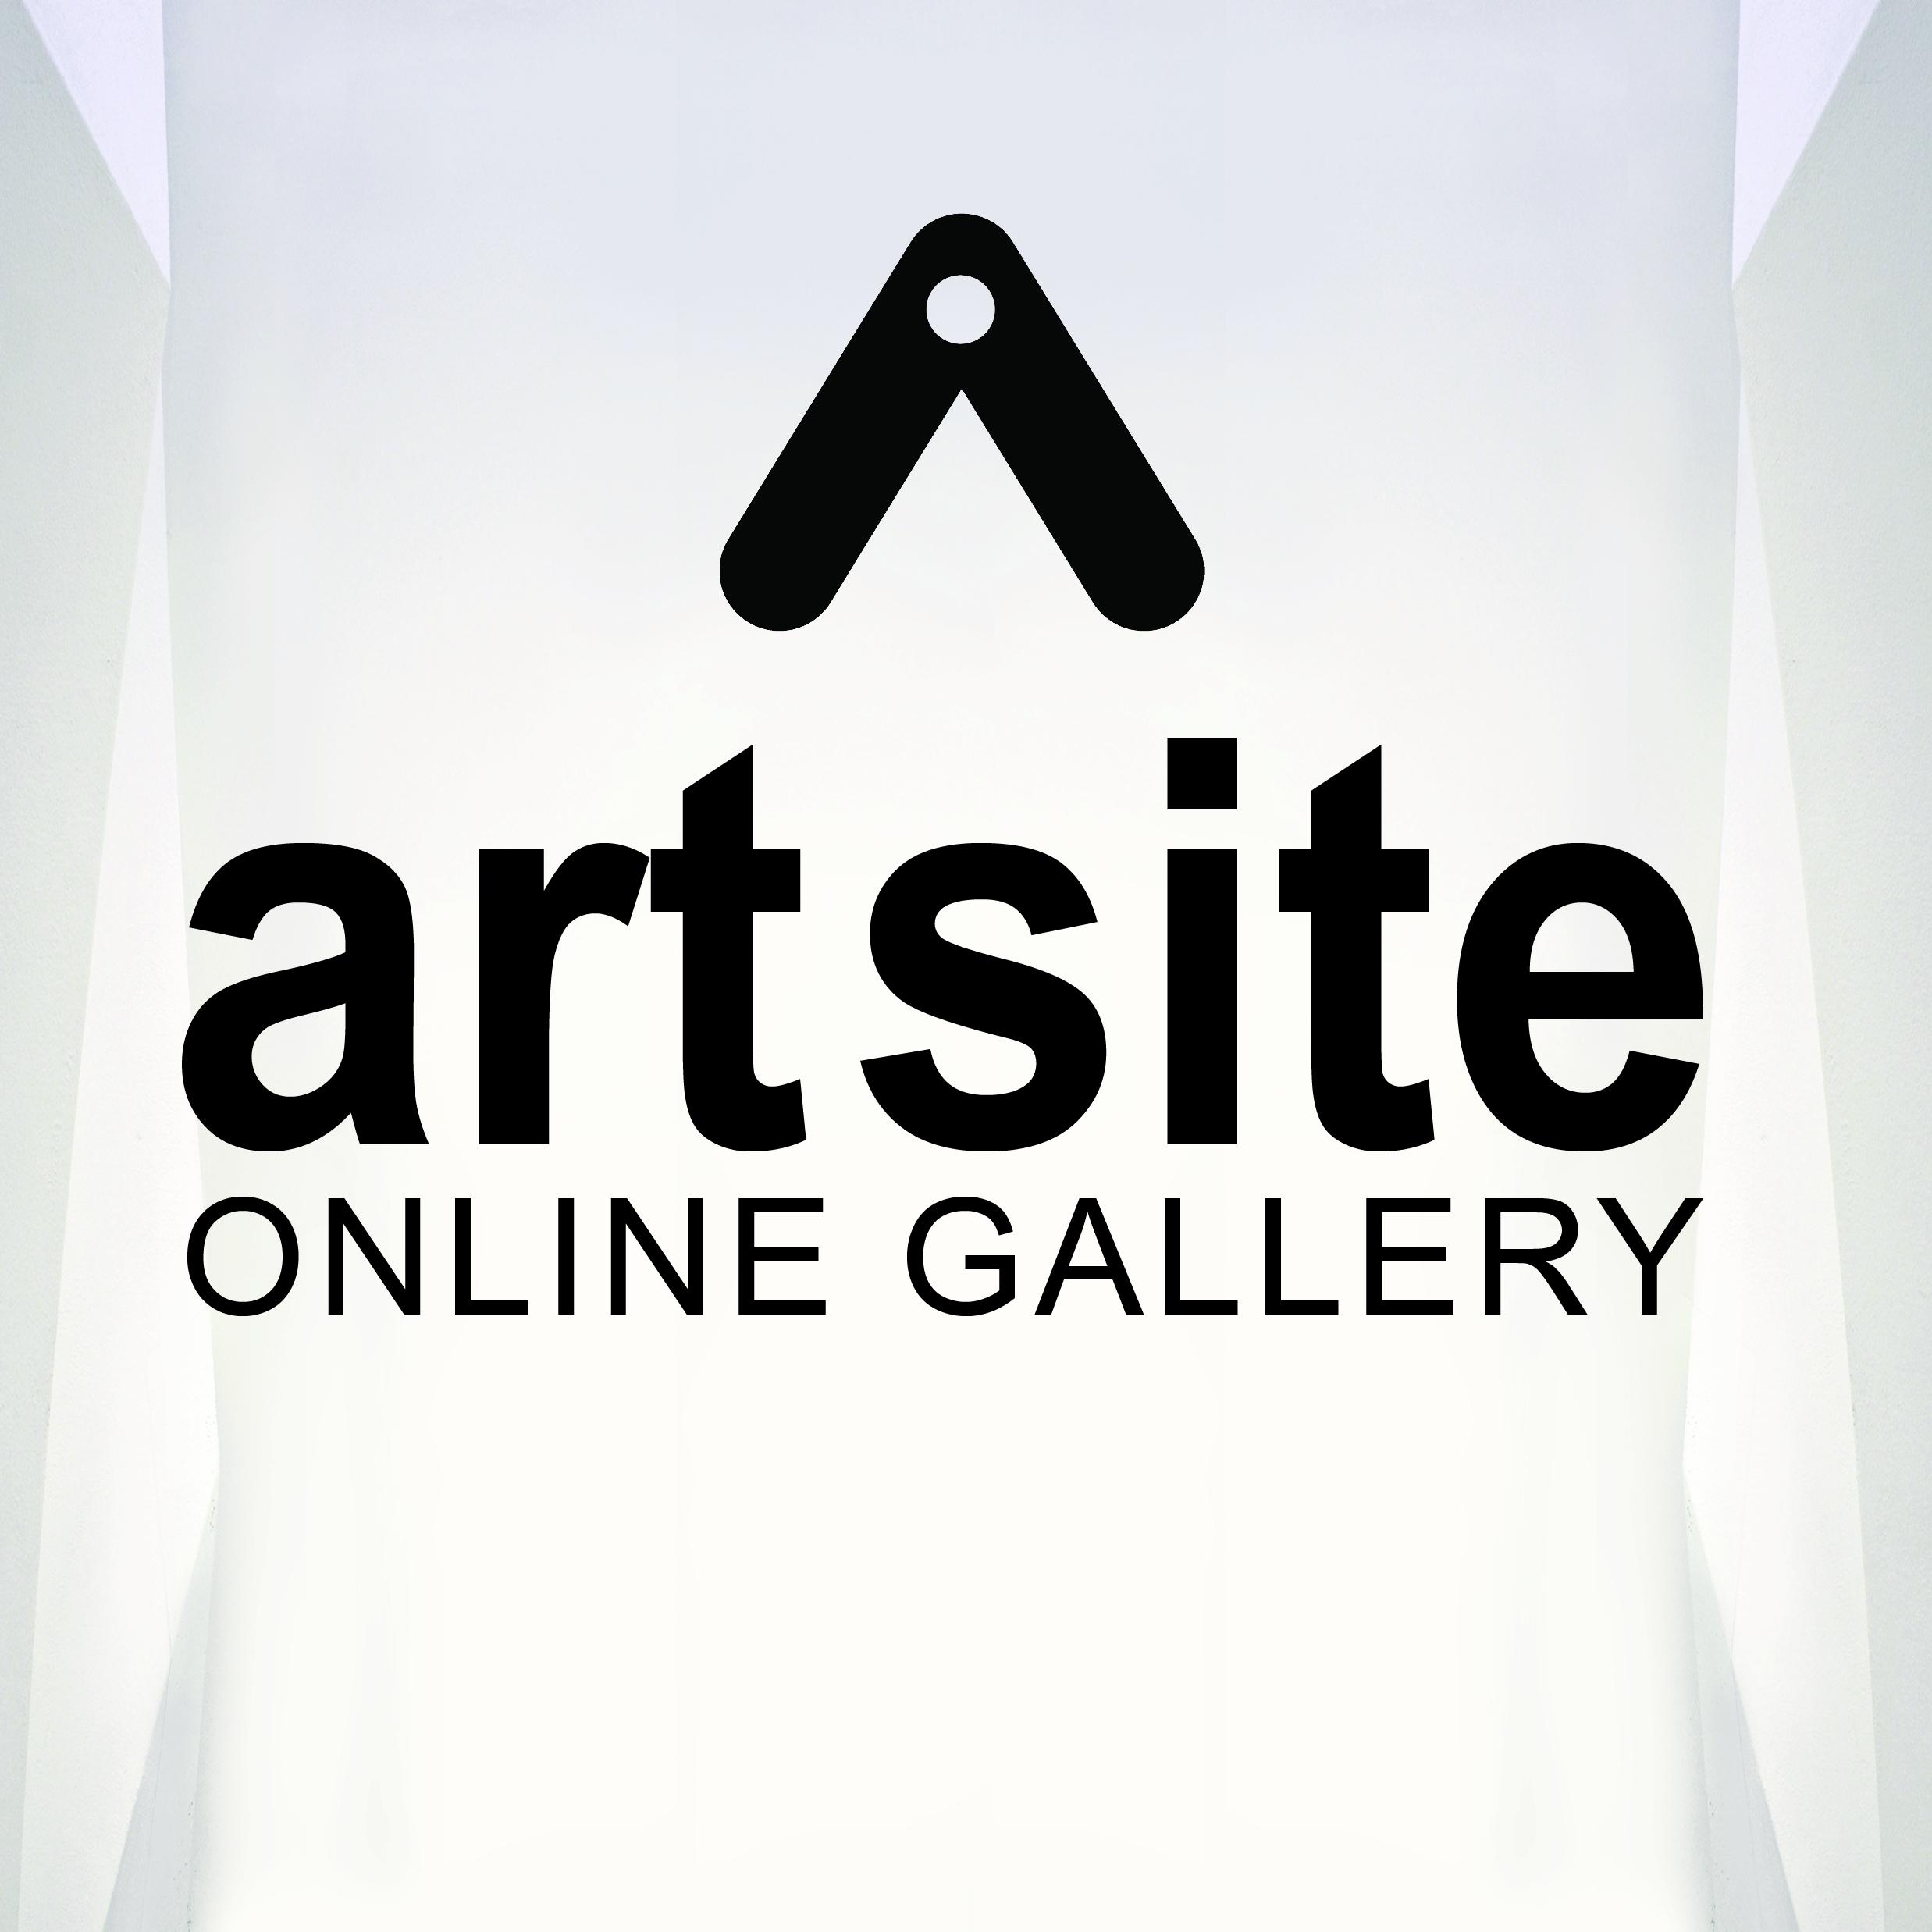 SHOP ARTWORK